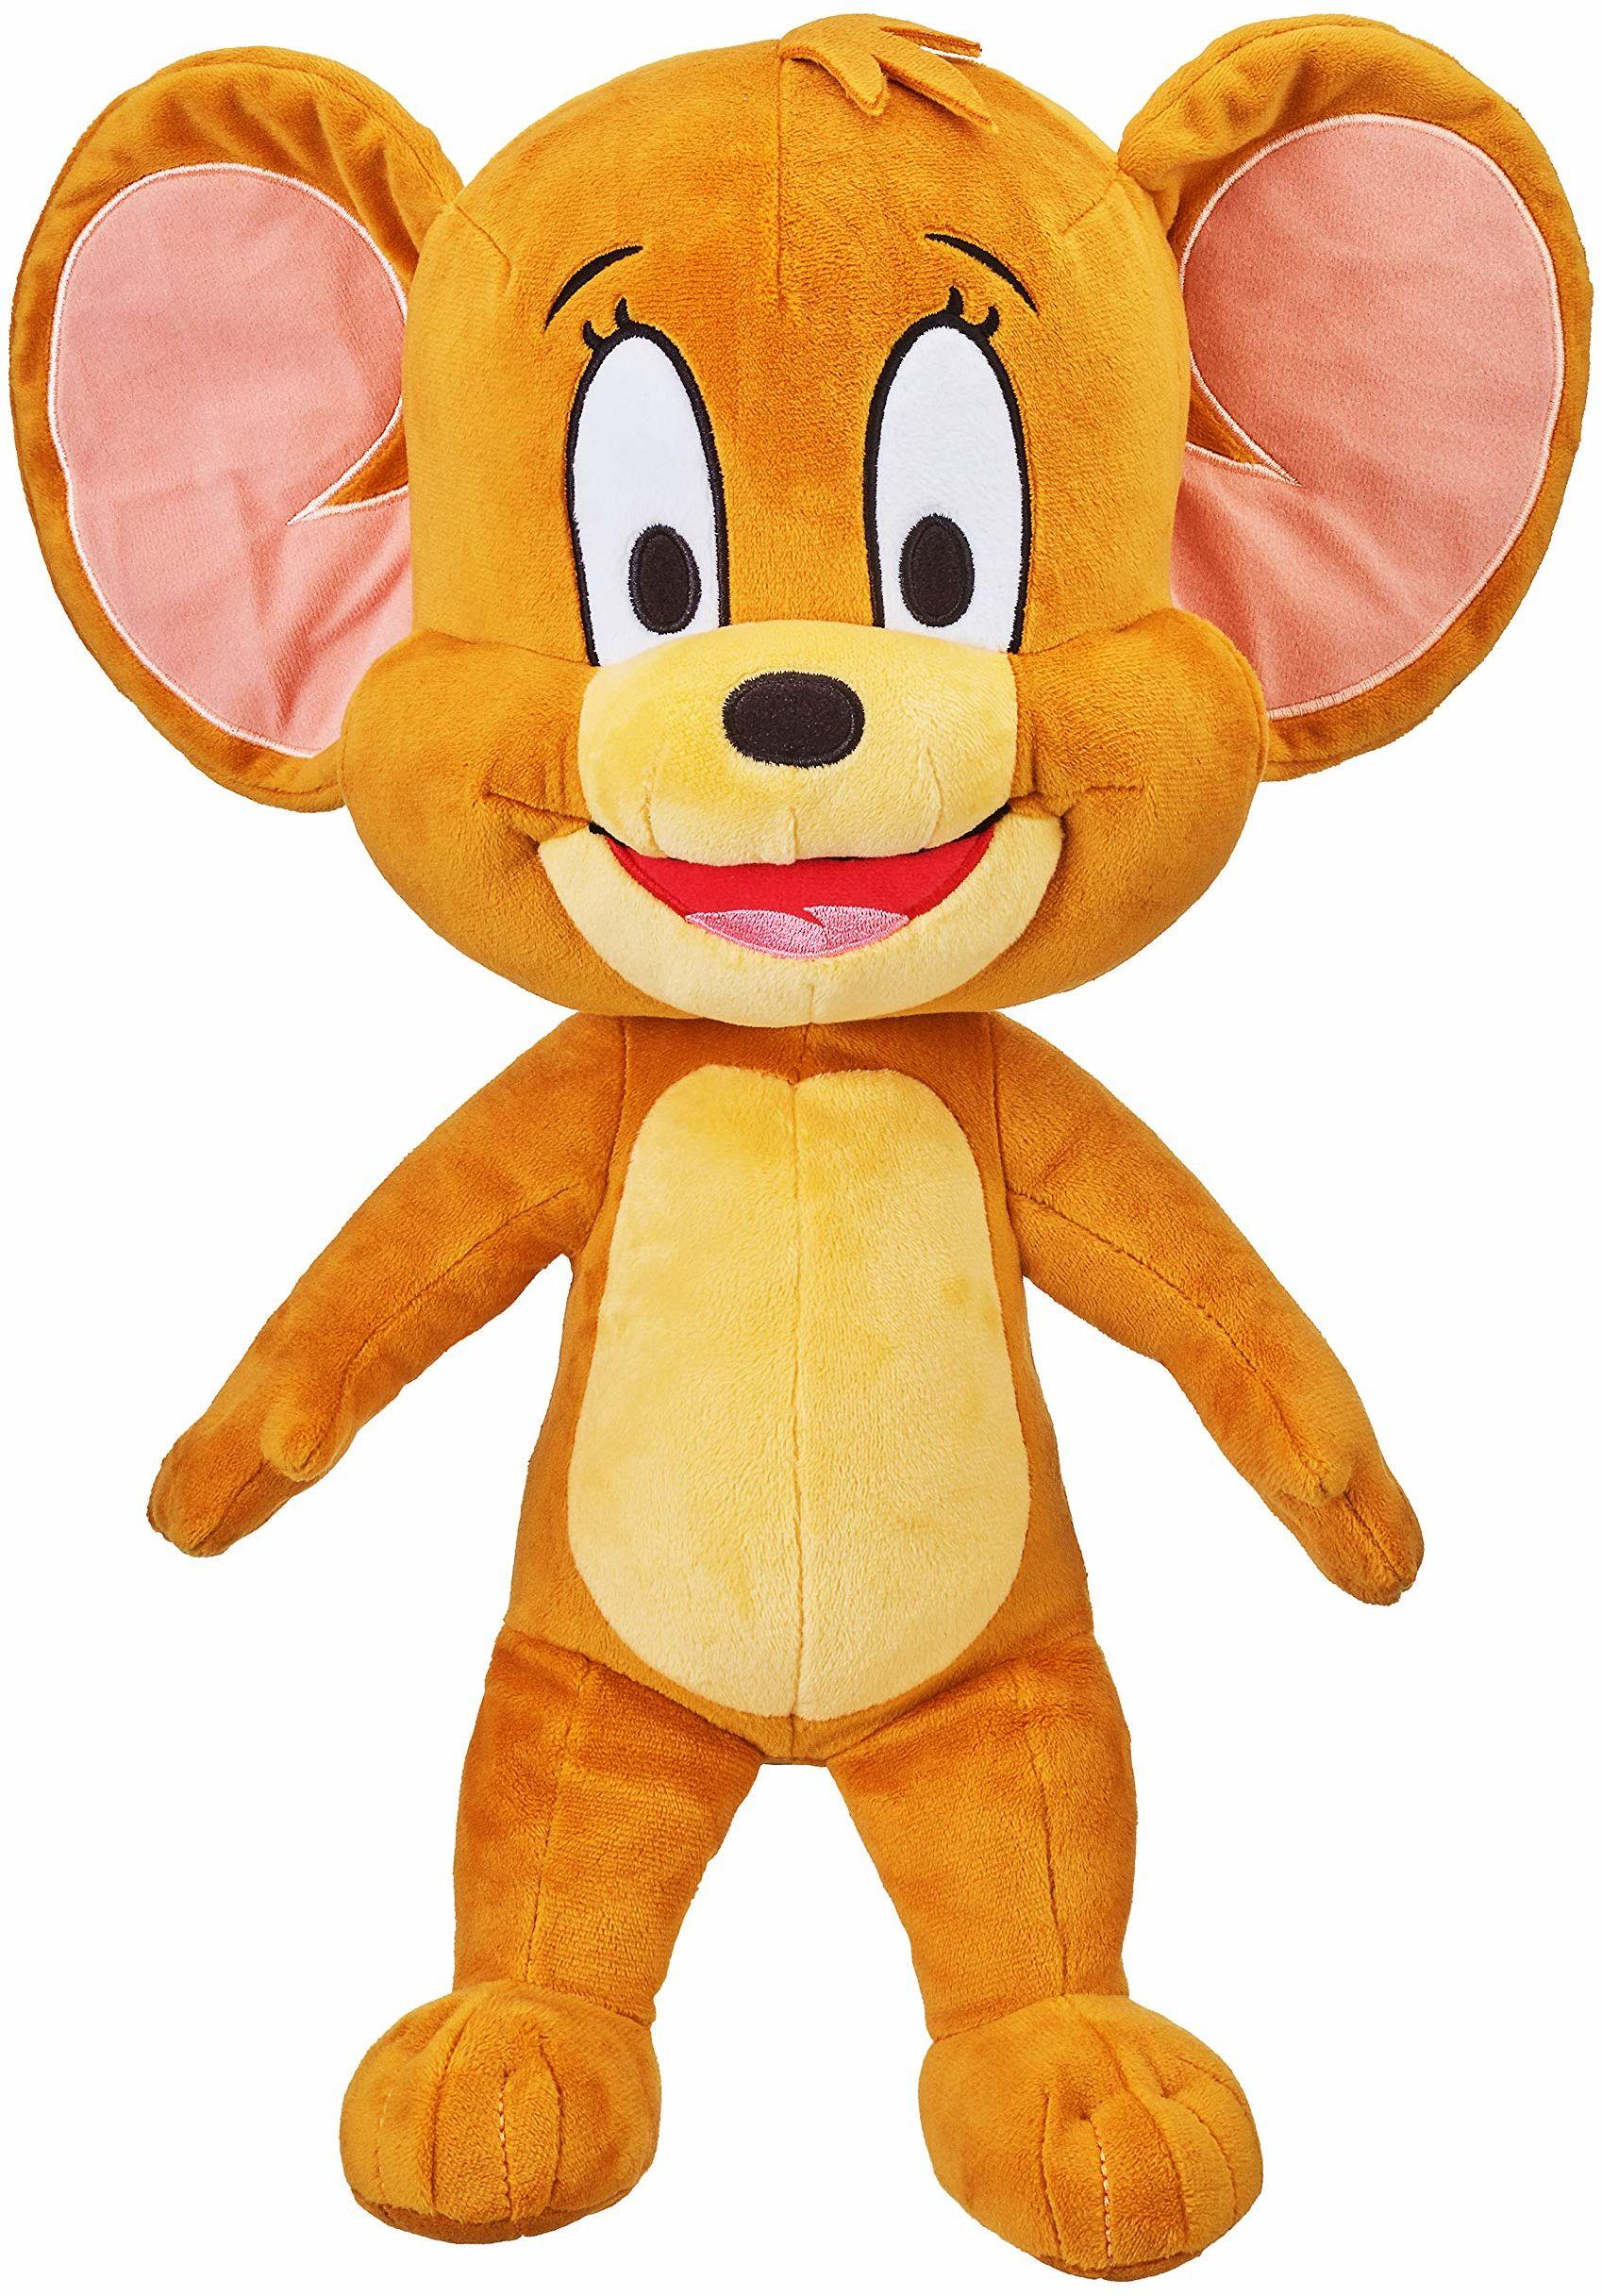 Tom & Jerry 14456 40 cm Jumbo Plush: Jerry